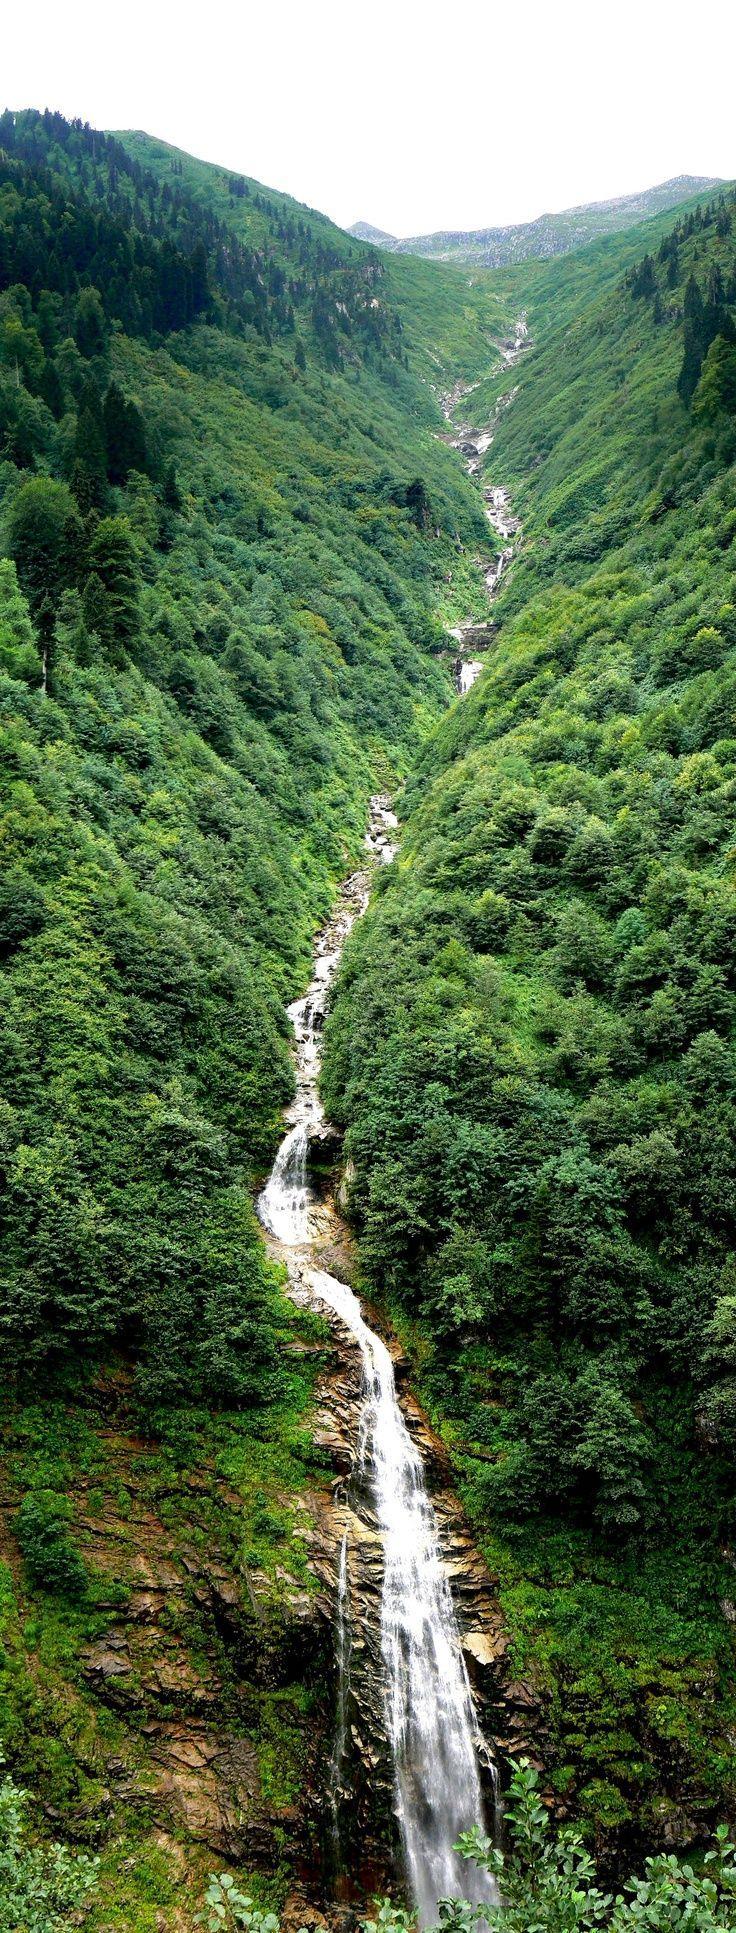 Waterfall at Ayder Yaylası – Rize,Turkey